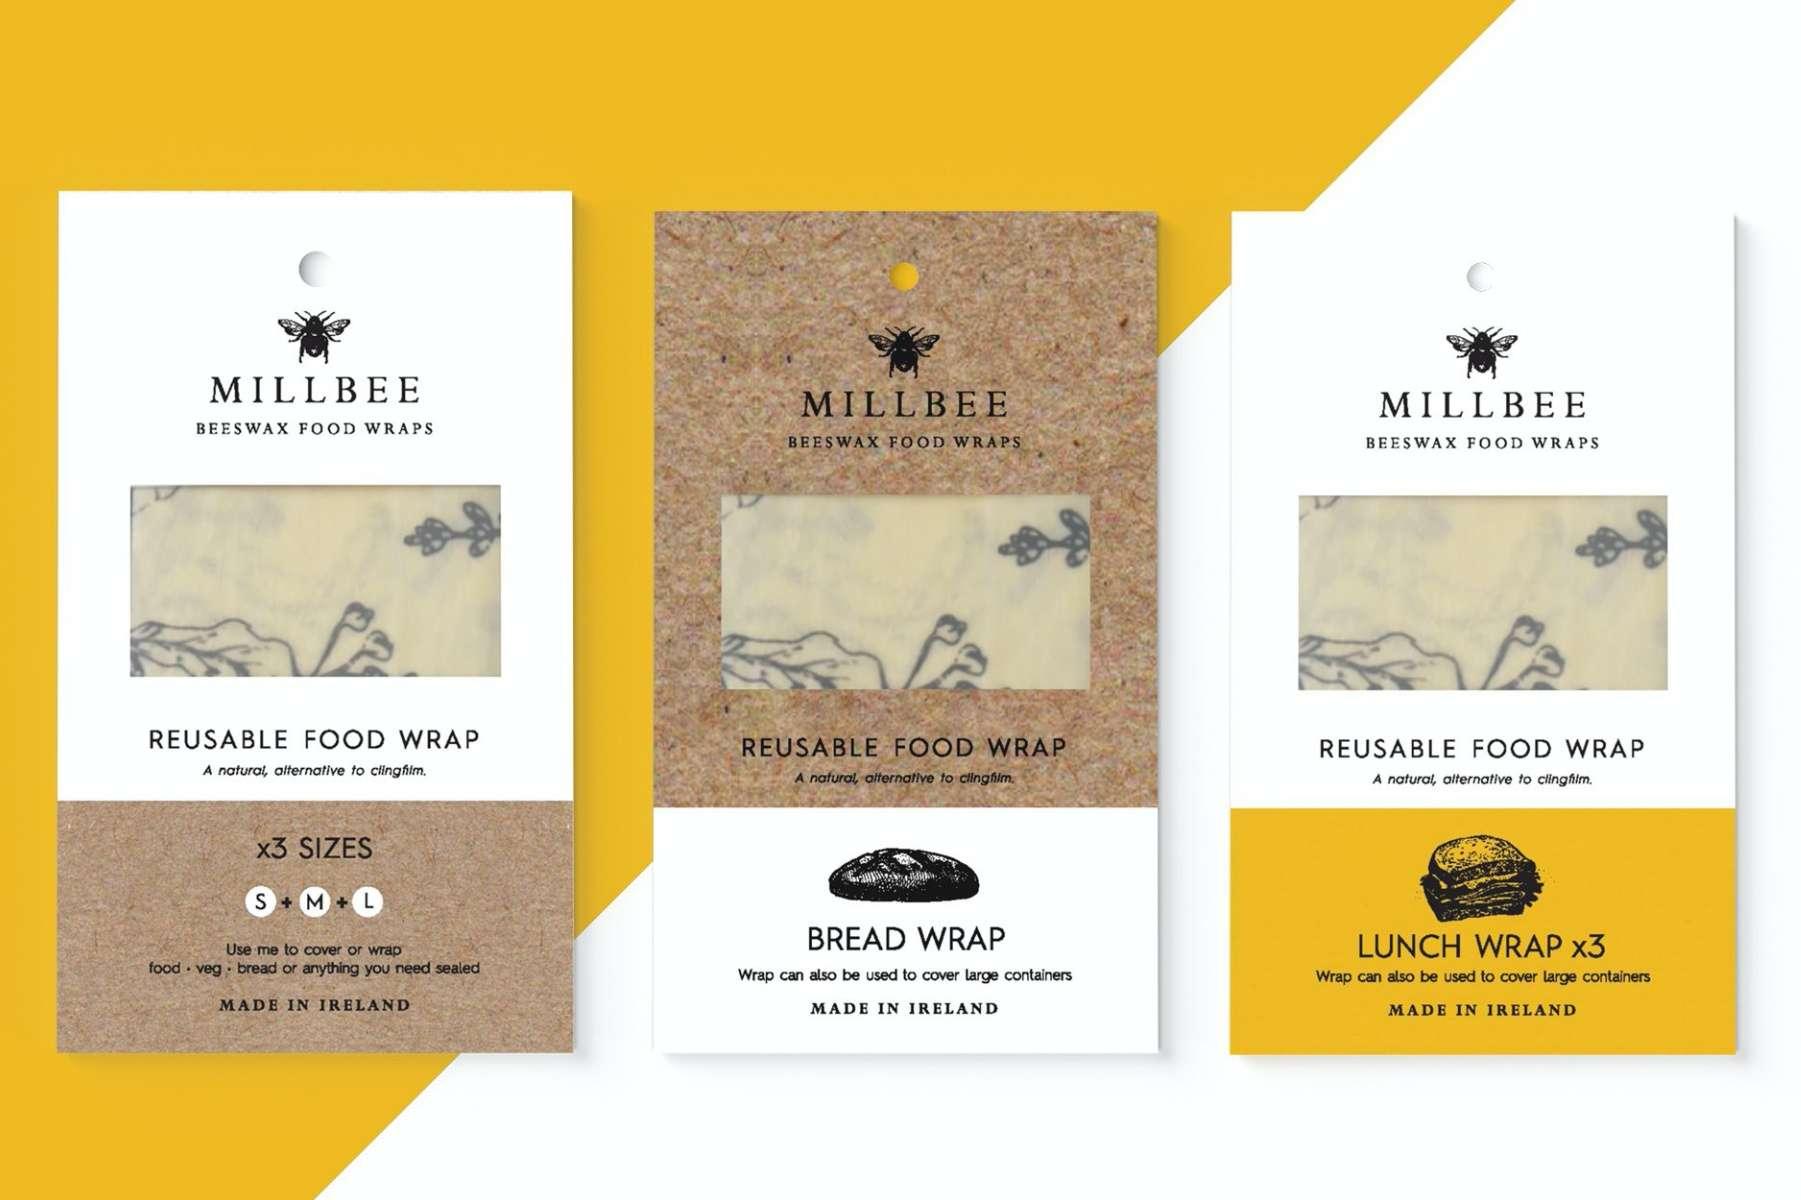 Millbee: This Irish Company is the Bee's Knees